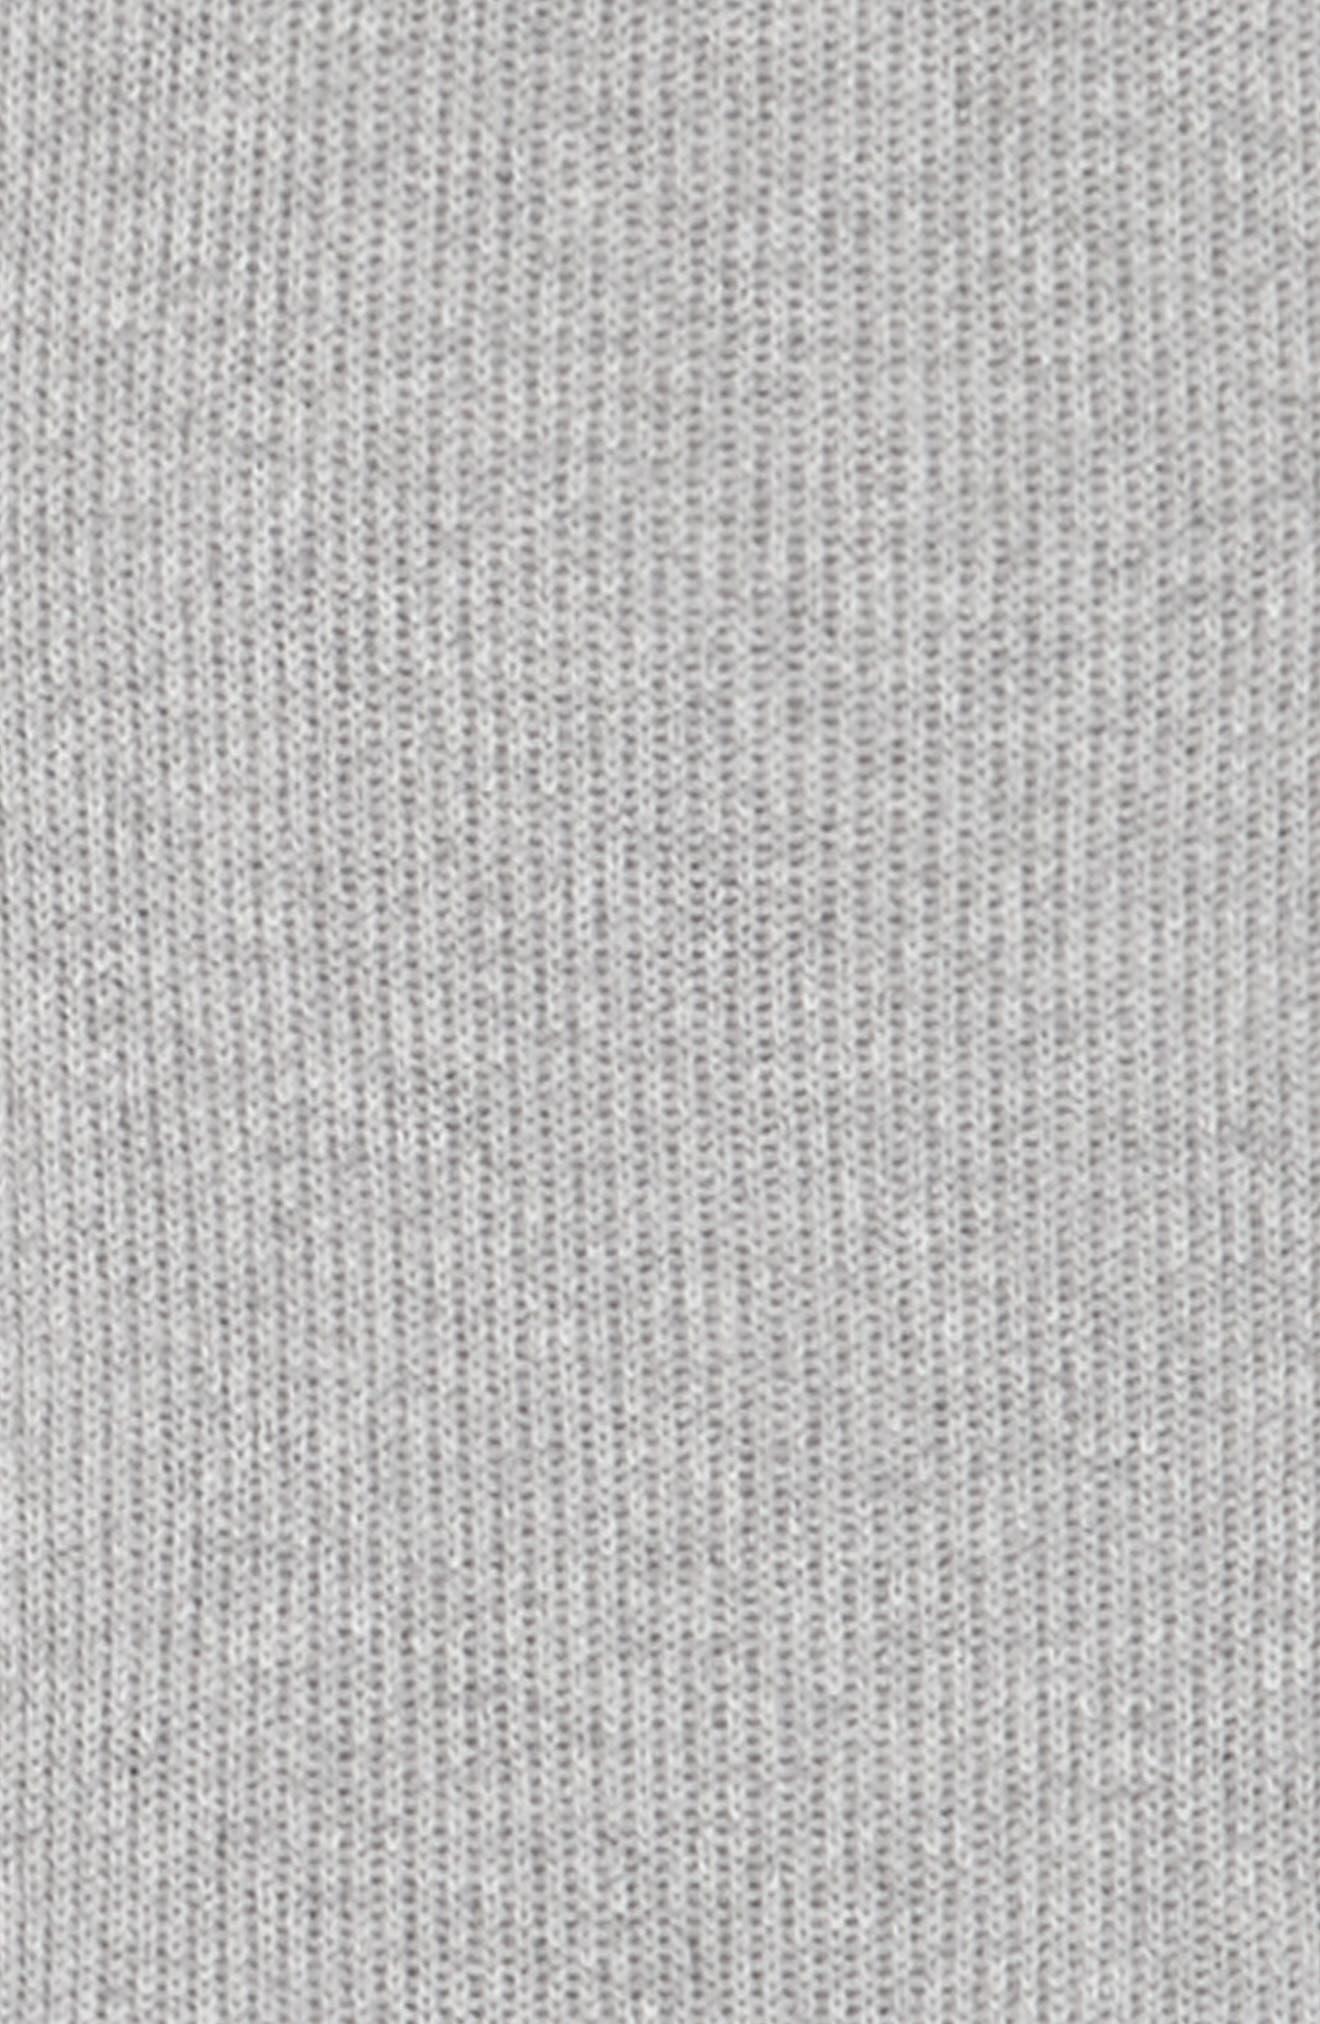 Alternate Image 3  - rag & bone Ace Rib Knit Cashmere Scarf